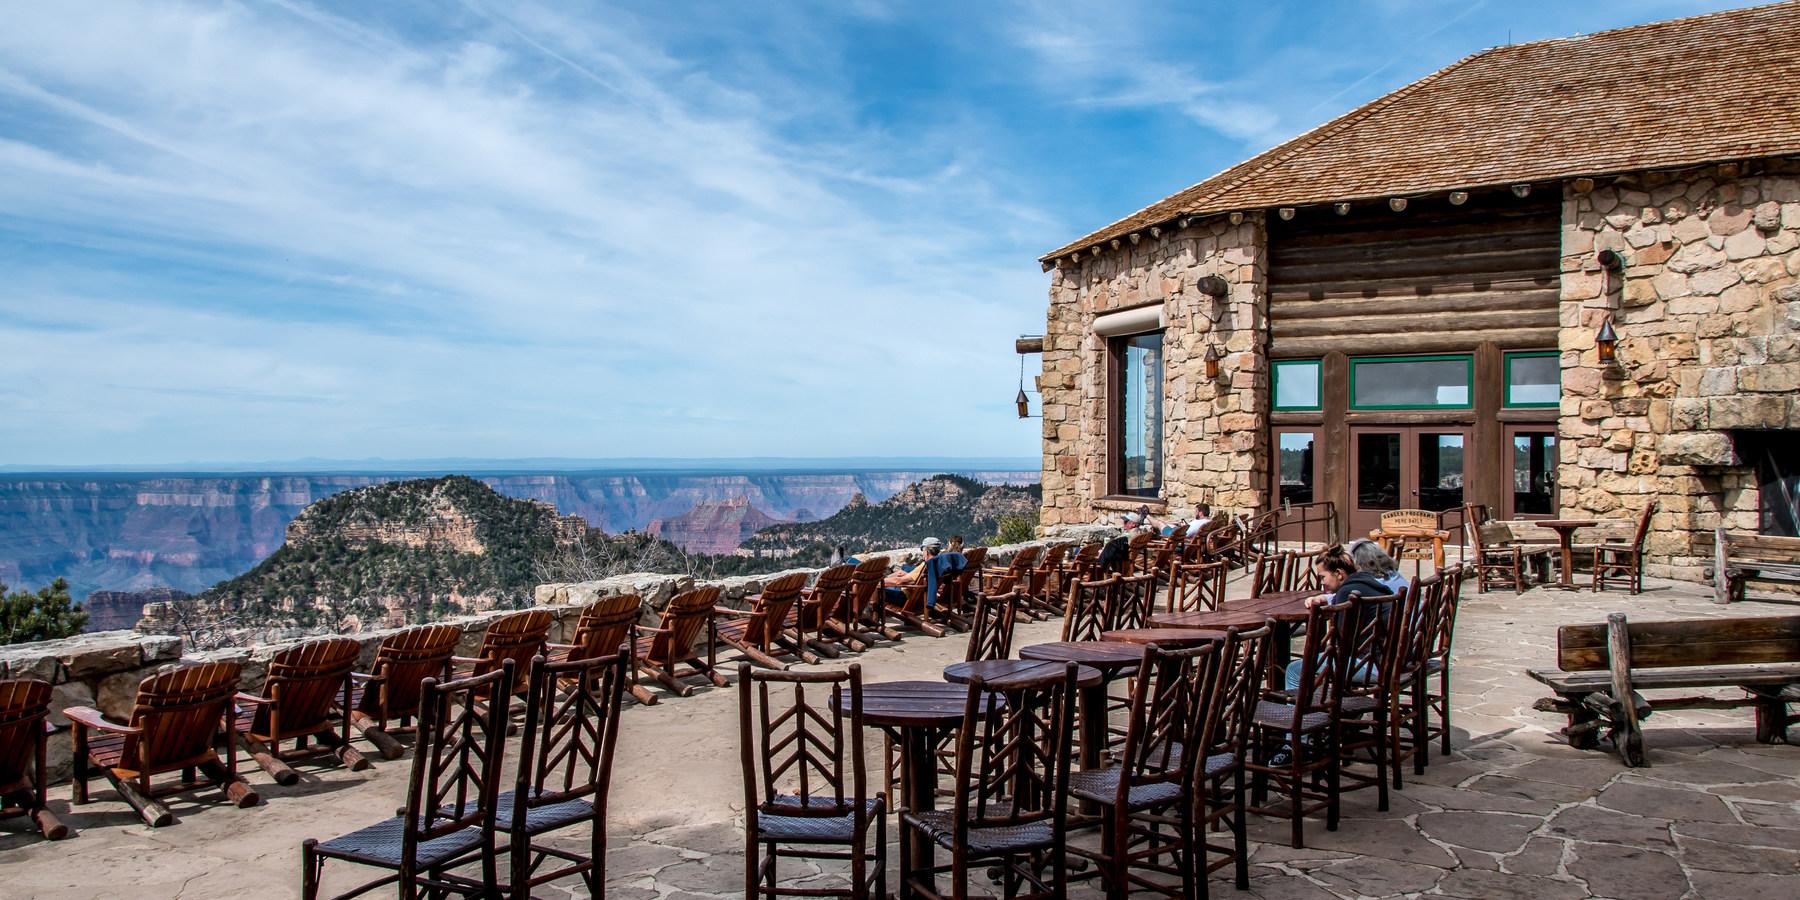 Grand Canyon Lodging 15 Best Accommodations